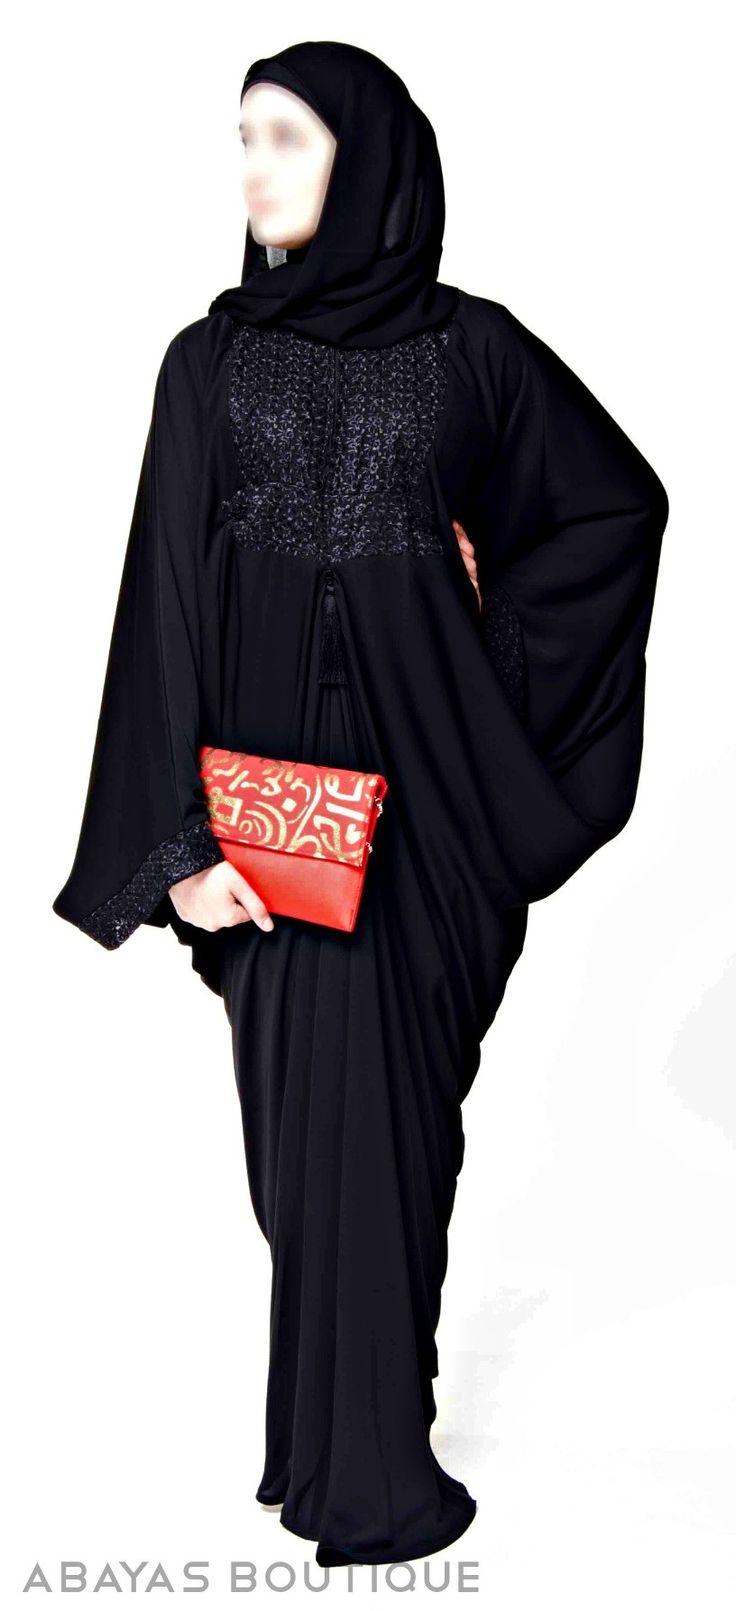 Madame Butterfly Abaya